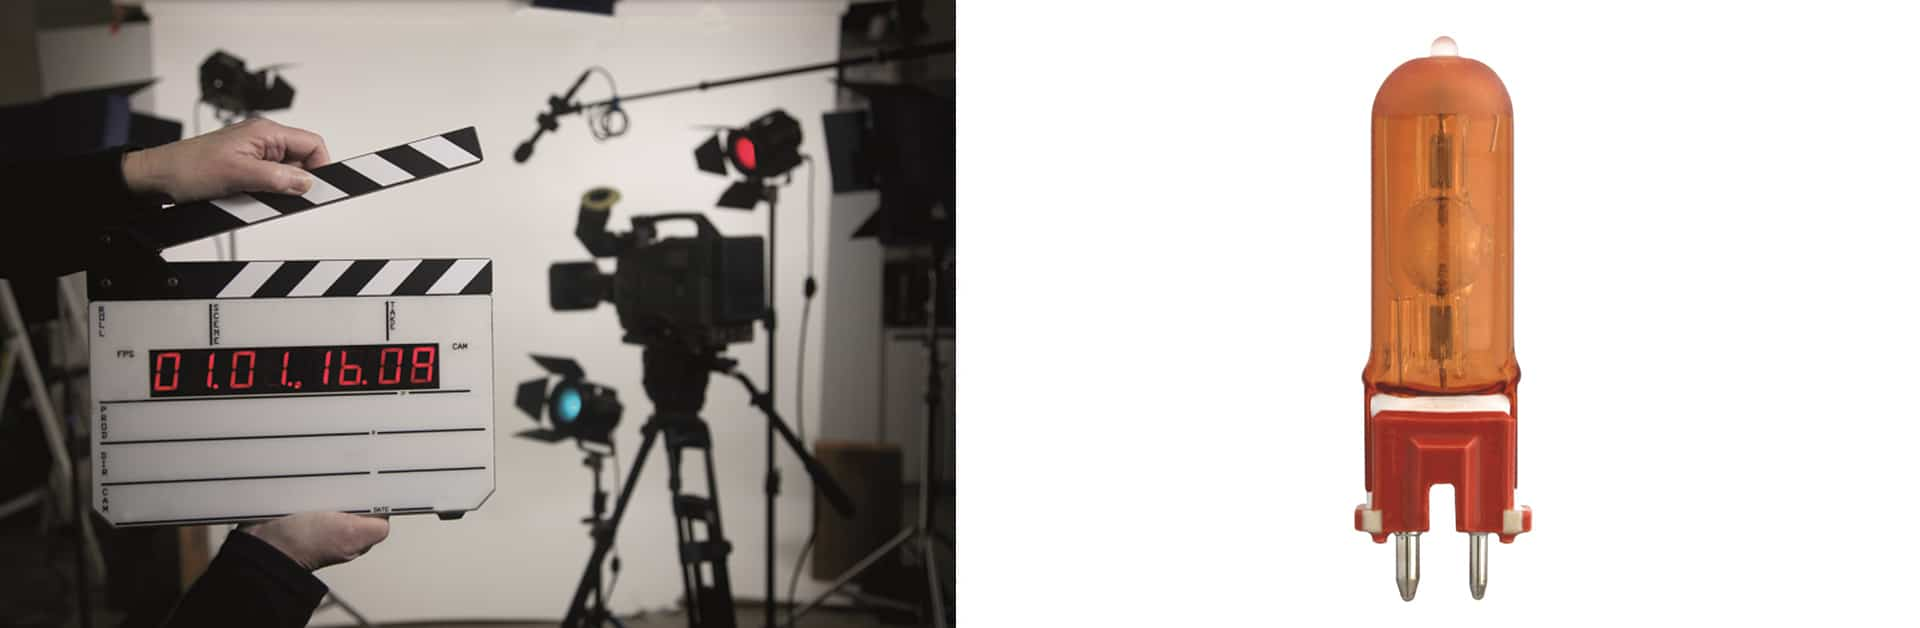 CameraLights